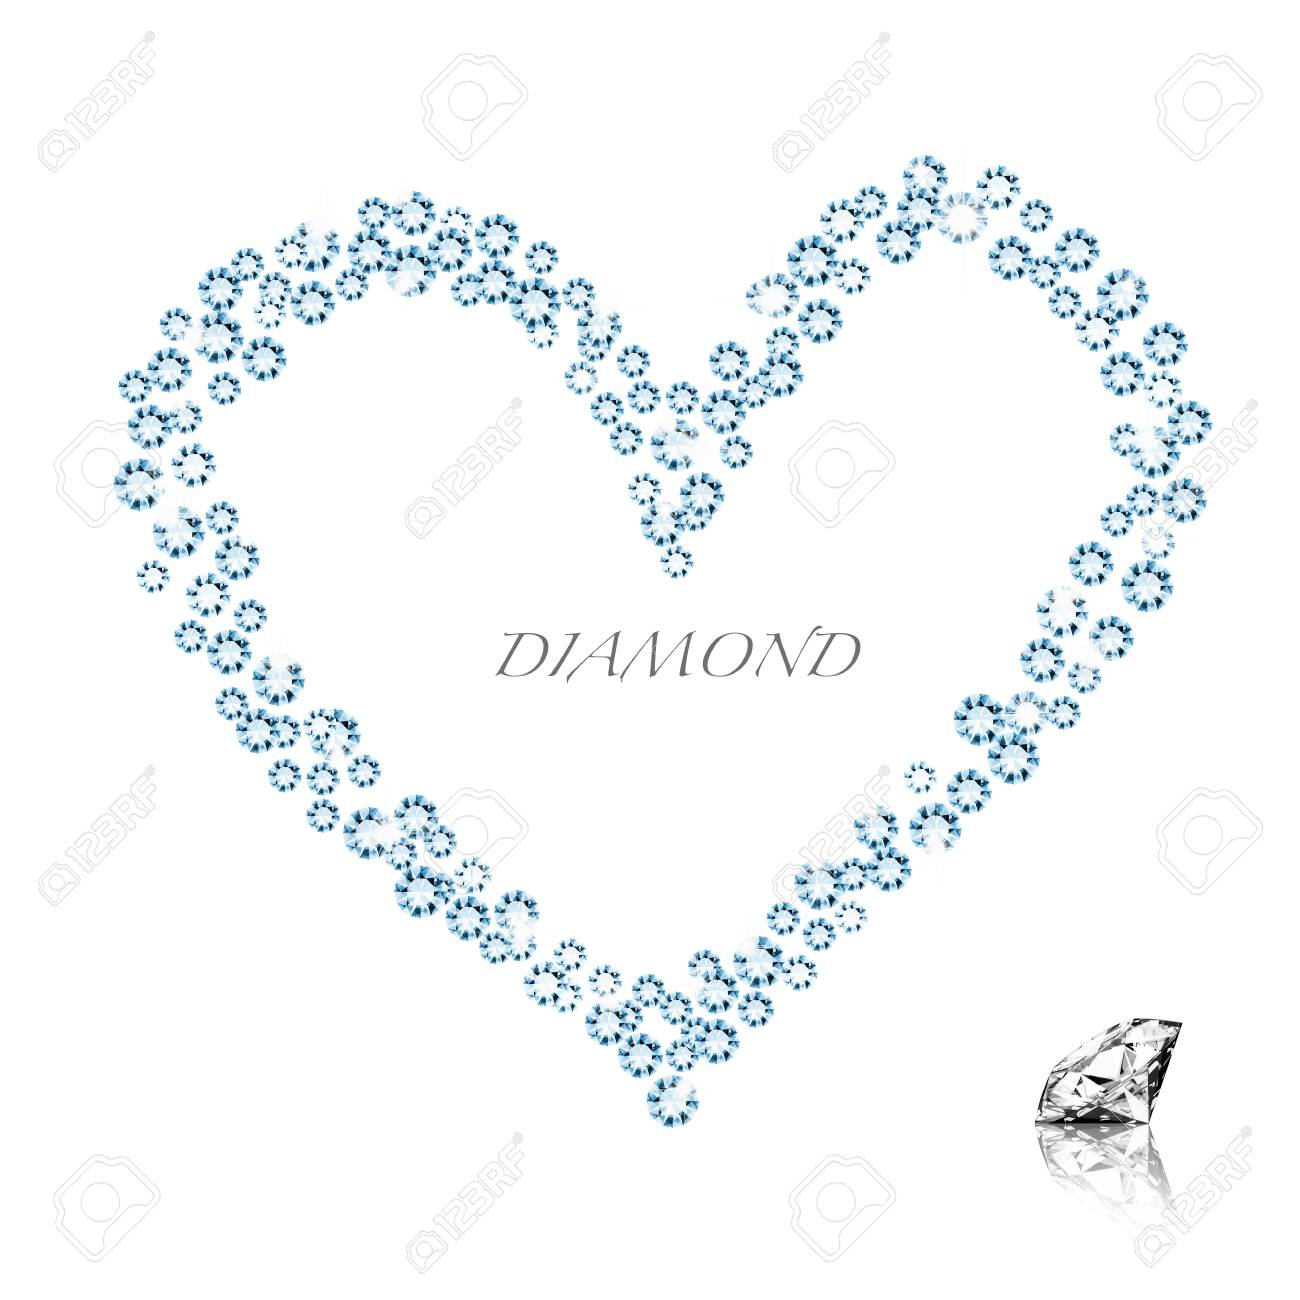 diamond heart on white background ,love valentine Stock Photo - 11824847